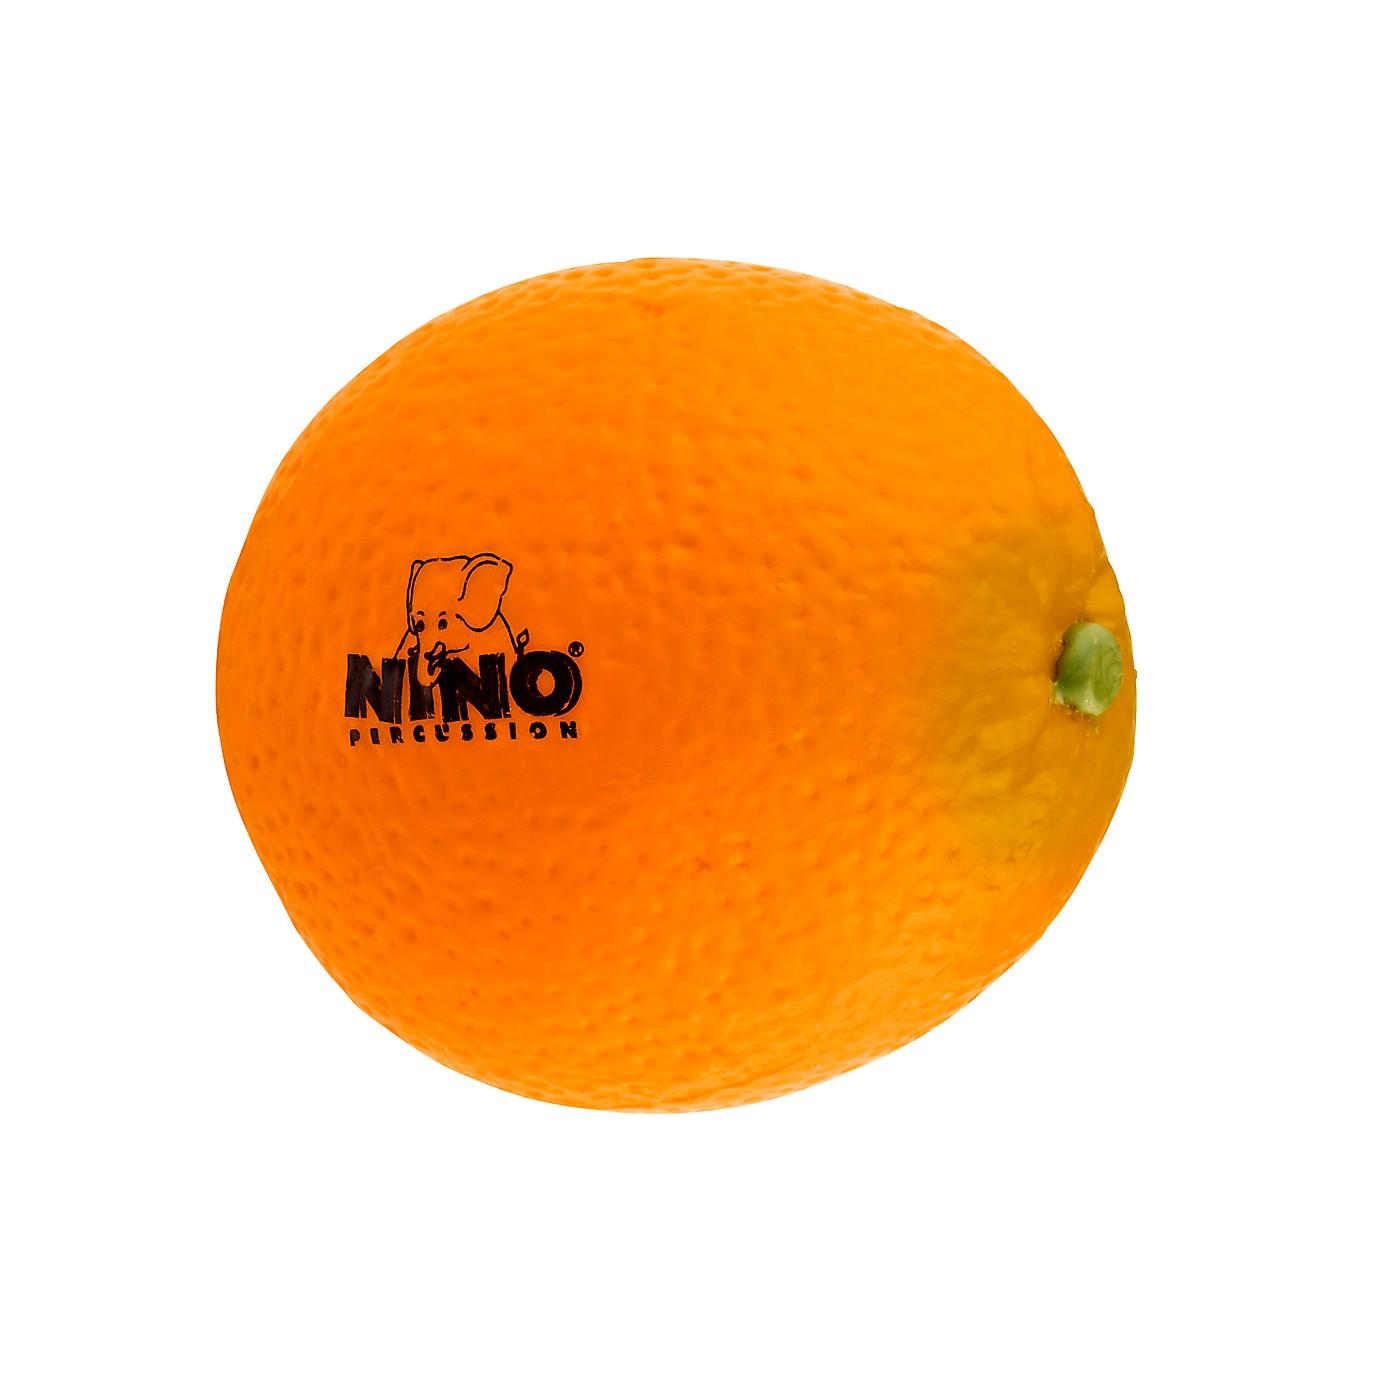 Nino Fruit Shaker Orange thumbnail